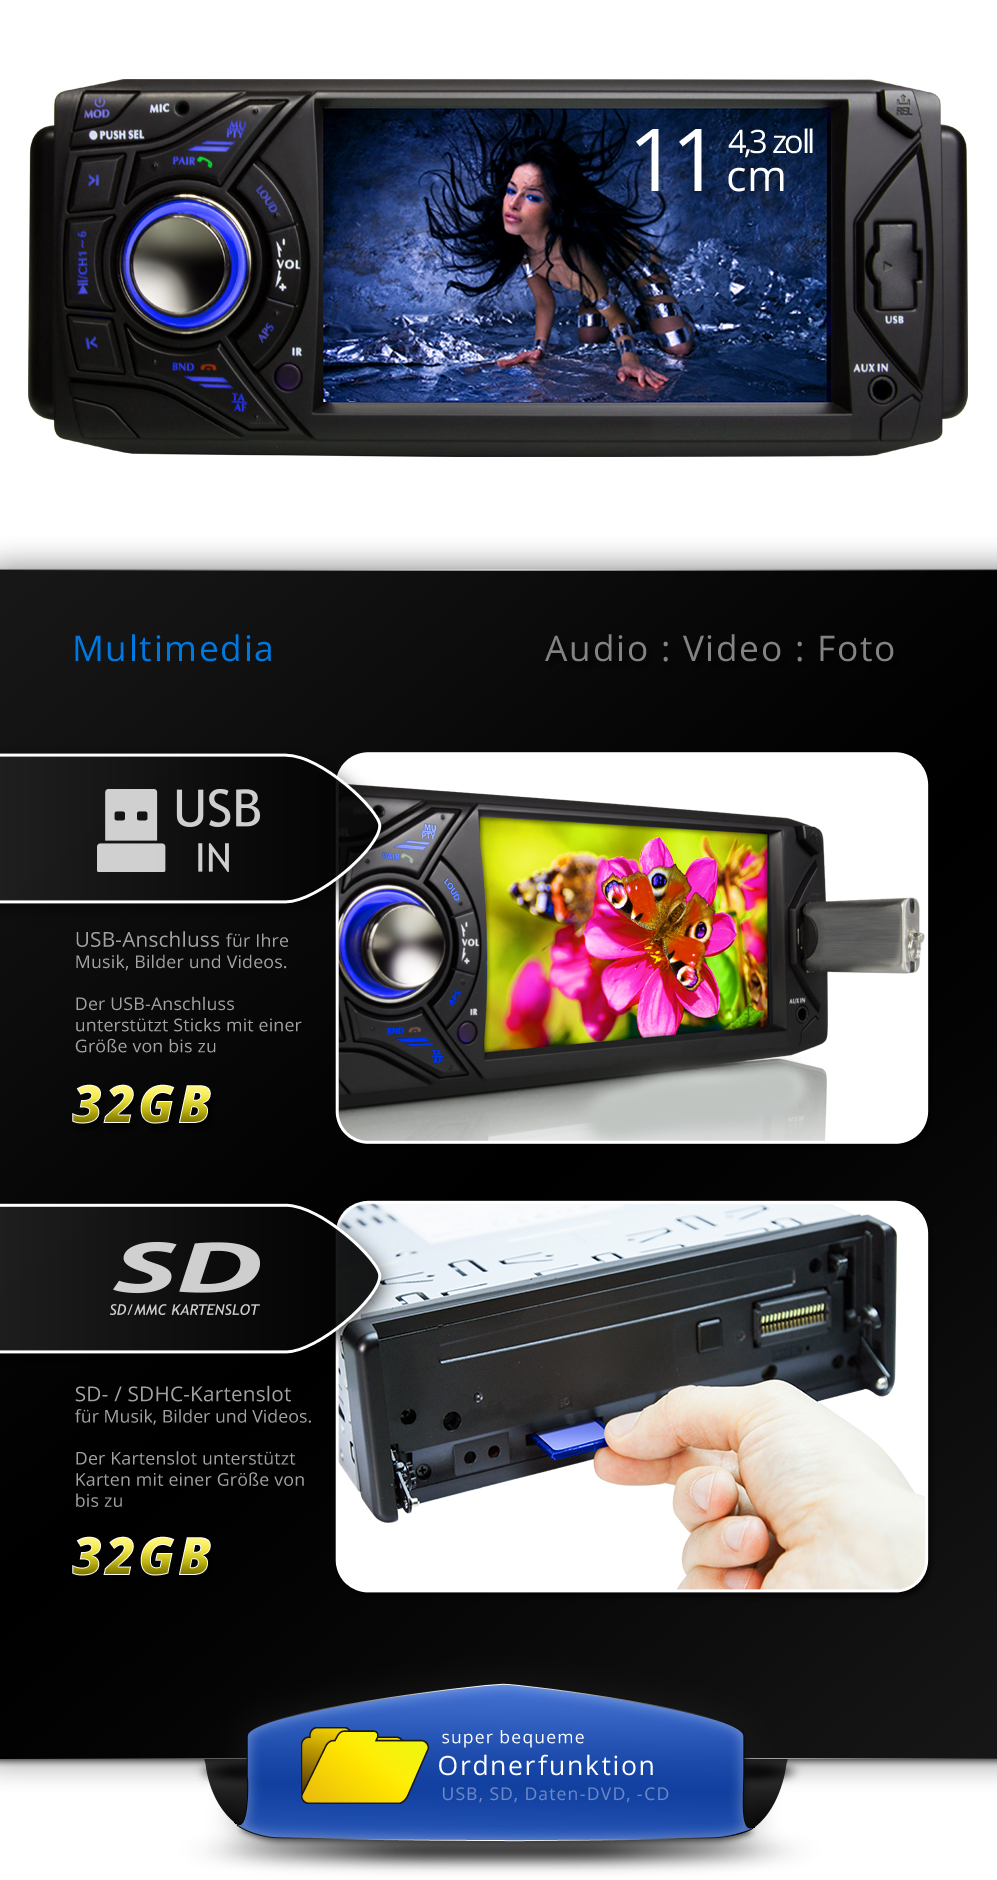 autoradio mit bluetooth touchscreen usb sd video mp3 1din. Black Bedroom Furniture Sets. Home Design Ideas